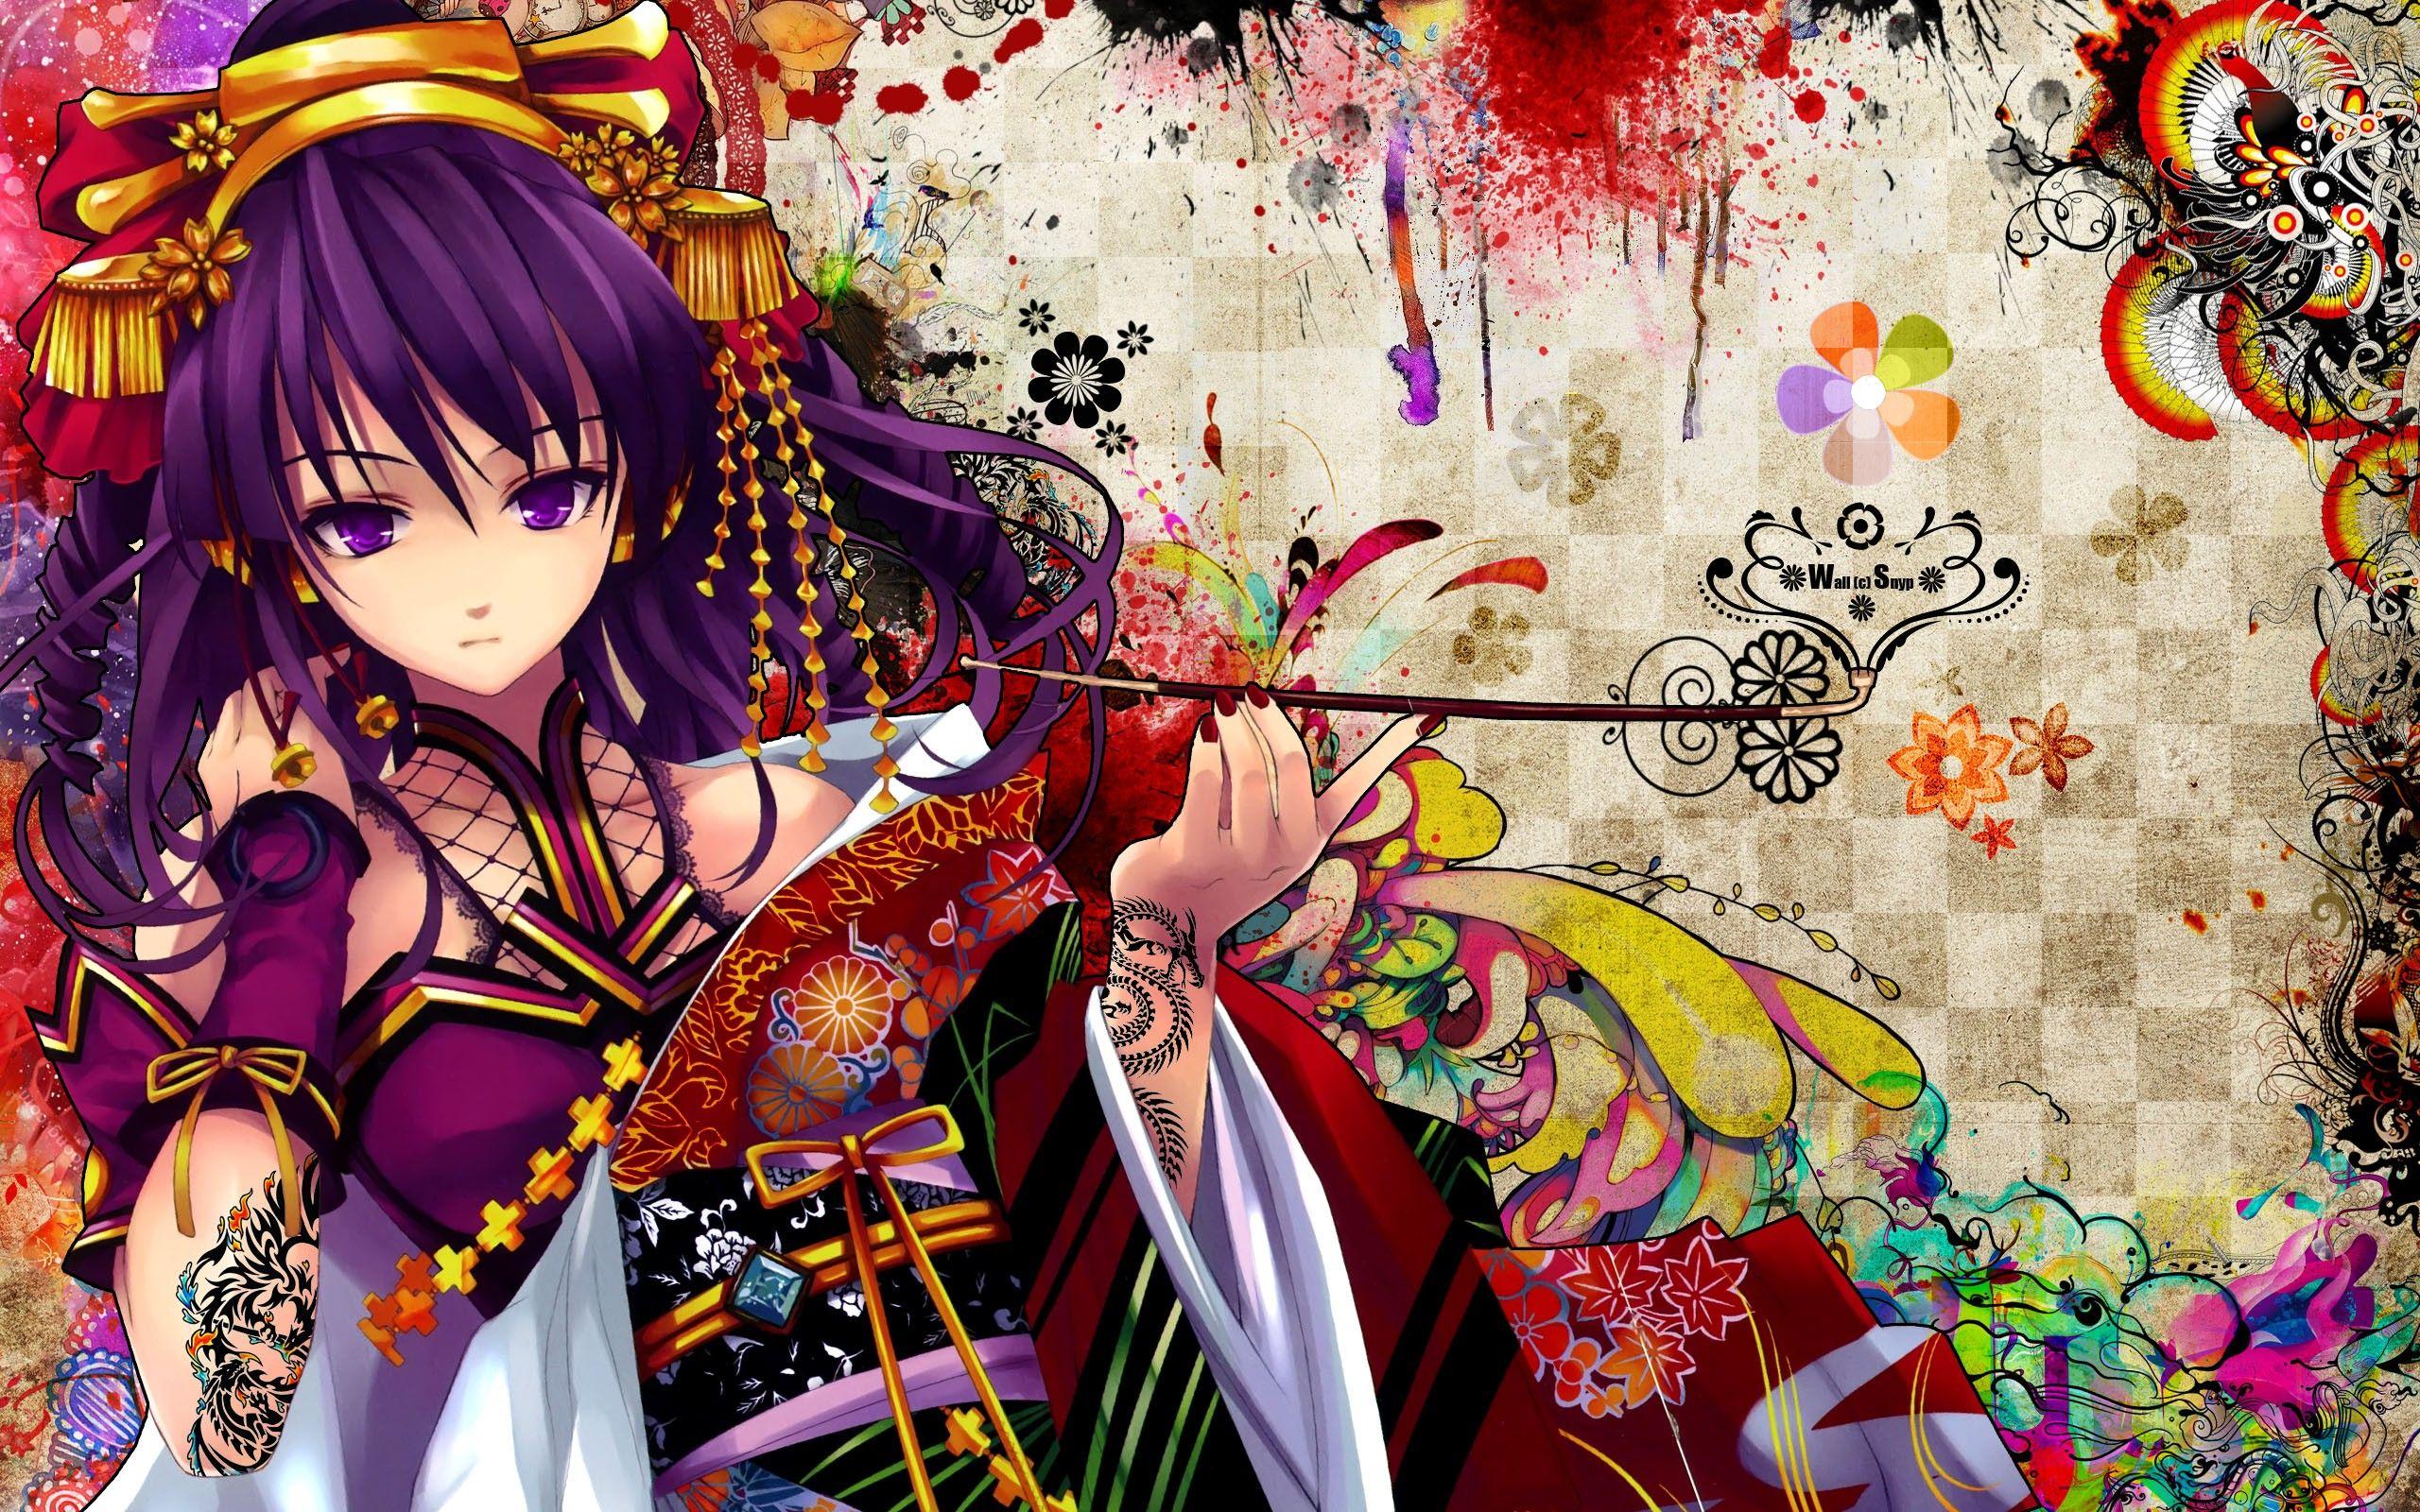 anime Beatmania purple hair anime girls manga 2560x1600